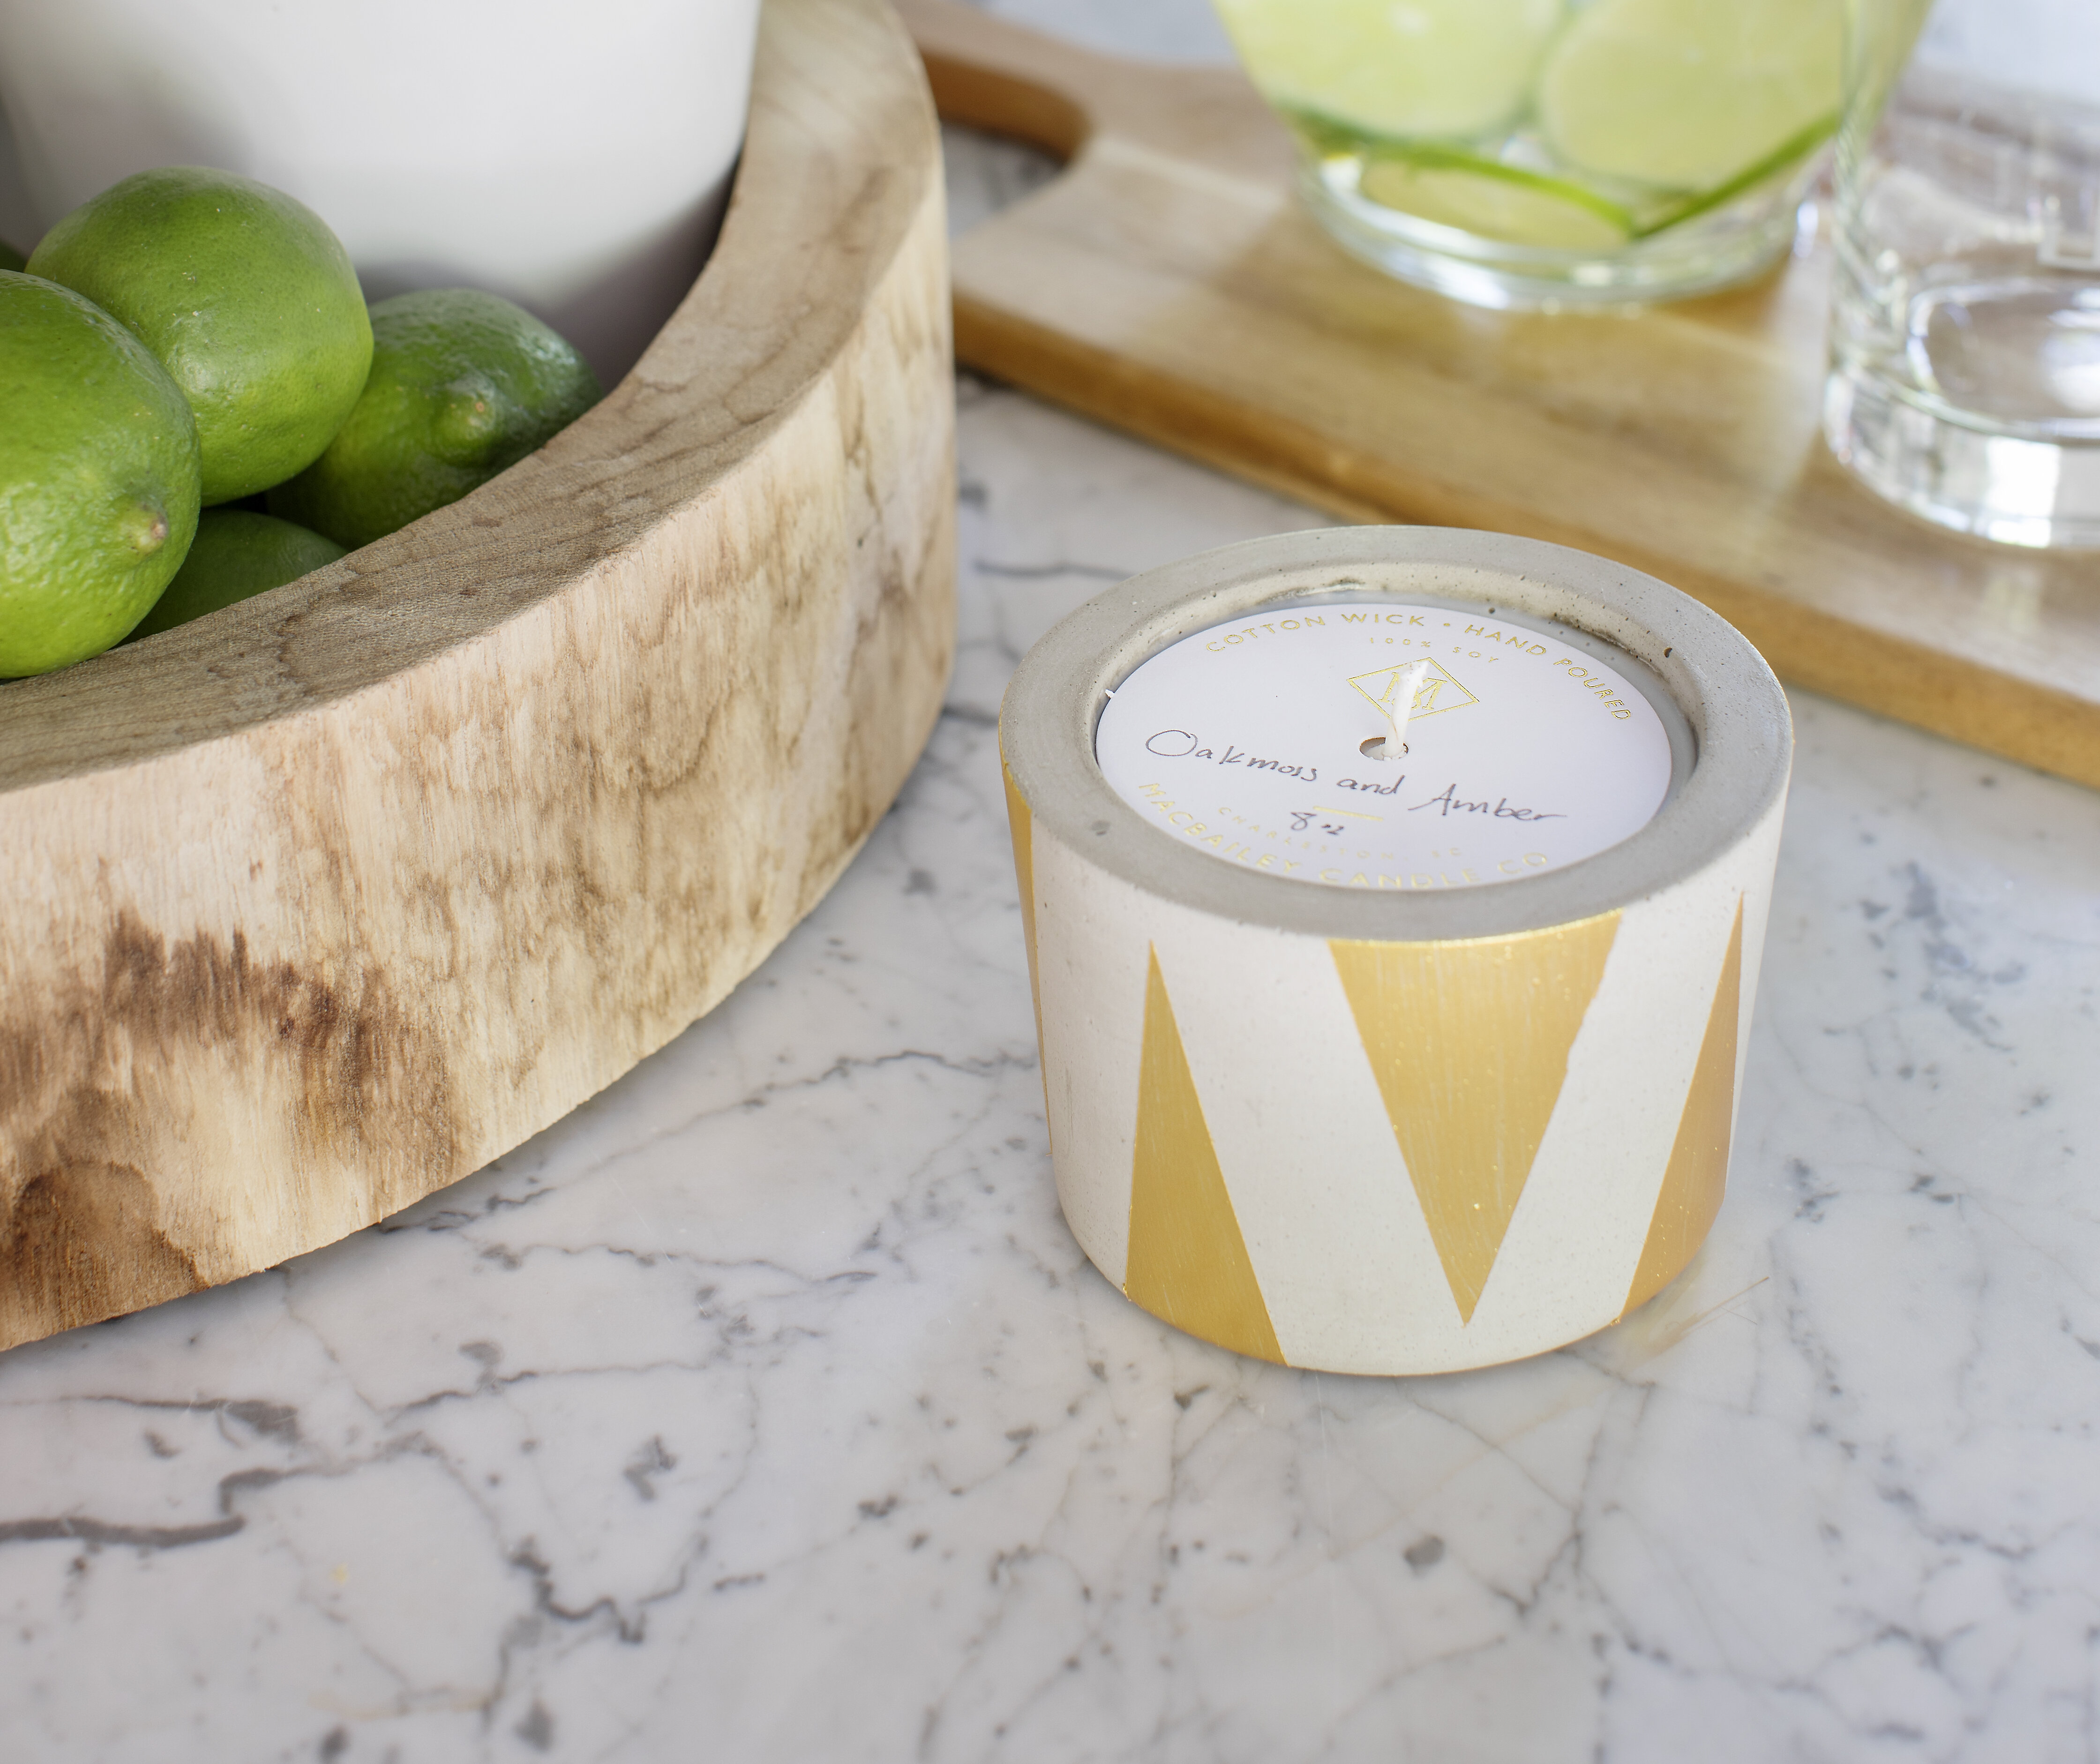 Jar Macbailey Candle Co Candles You Ll Love In 2021 Wayfair